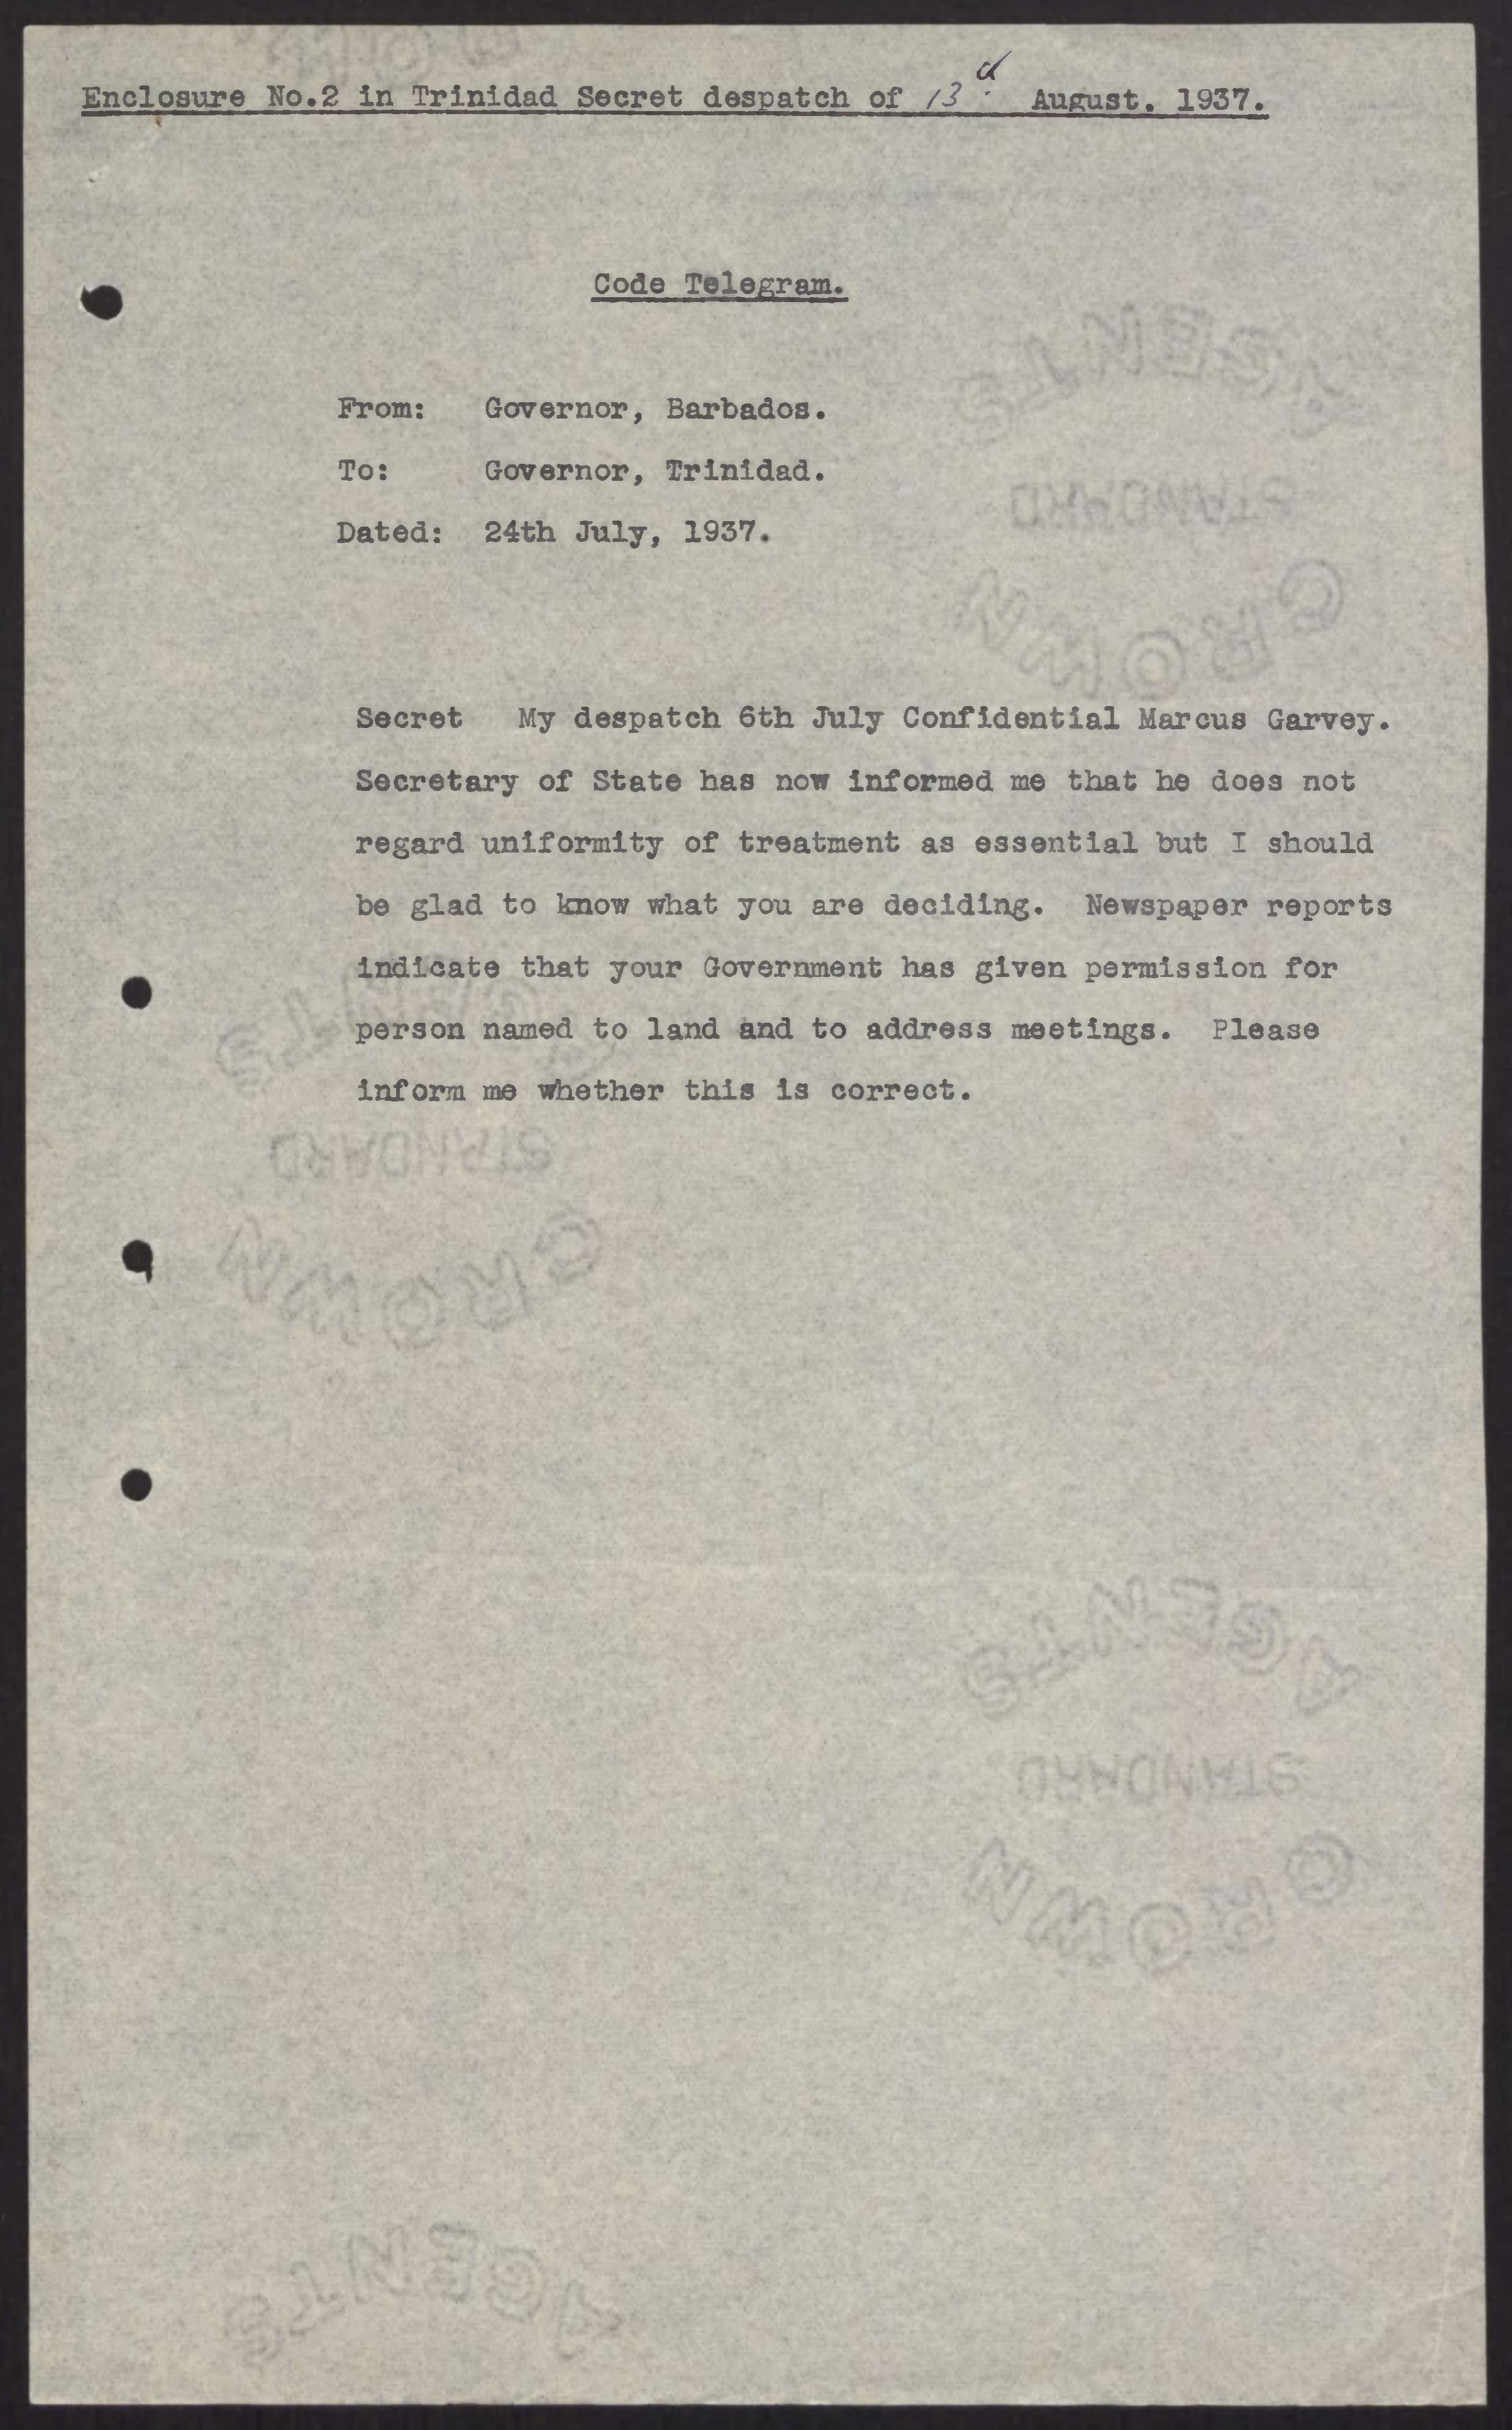 Copy of Code Telegram from Governor of Barbados to Governor